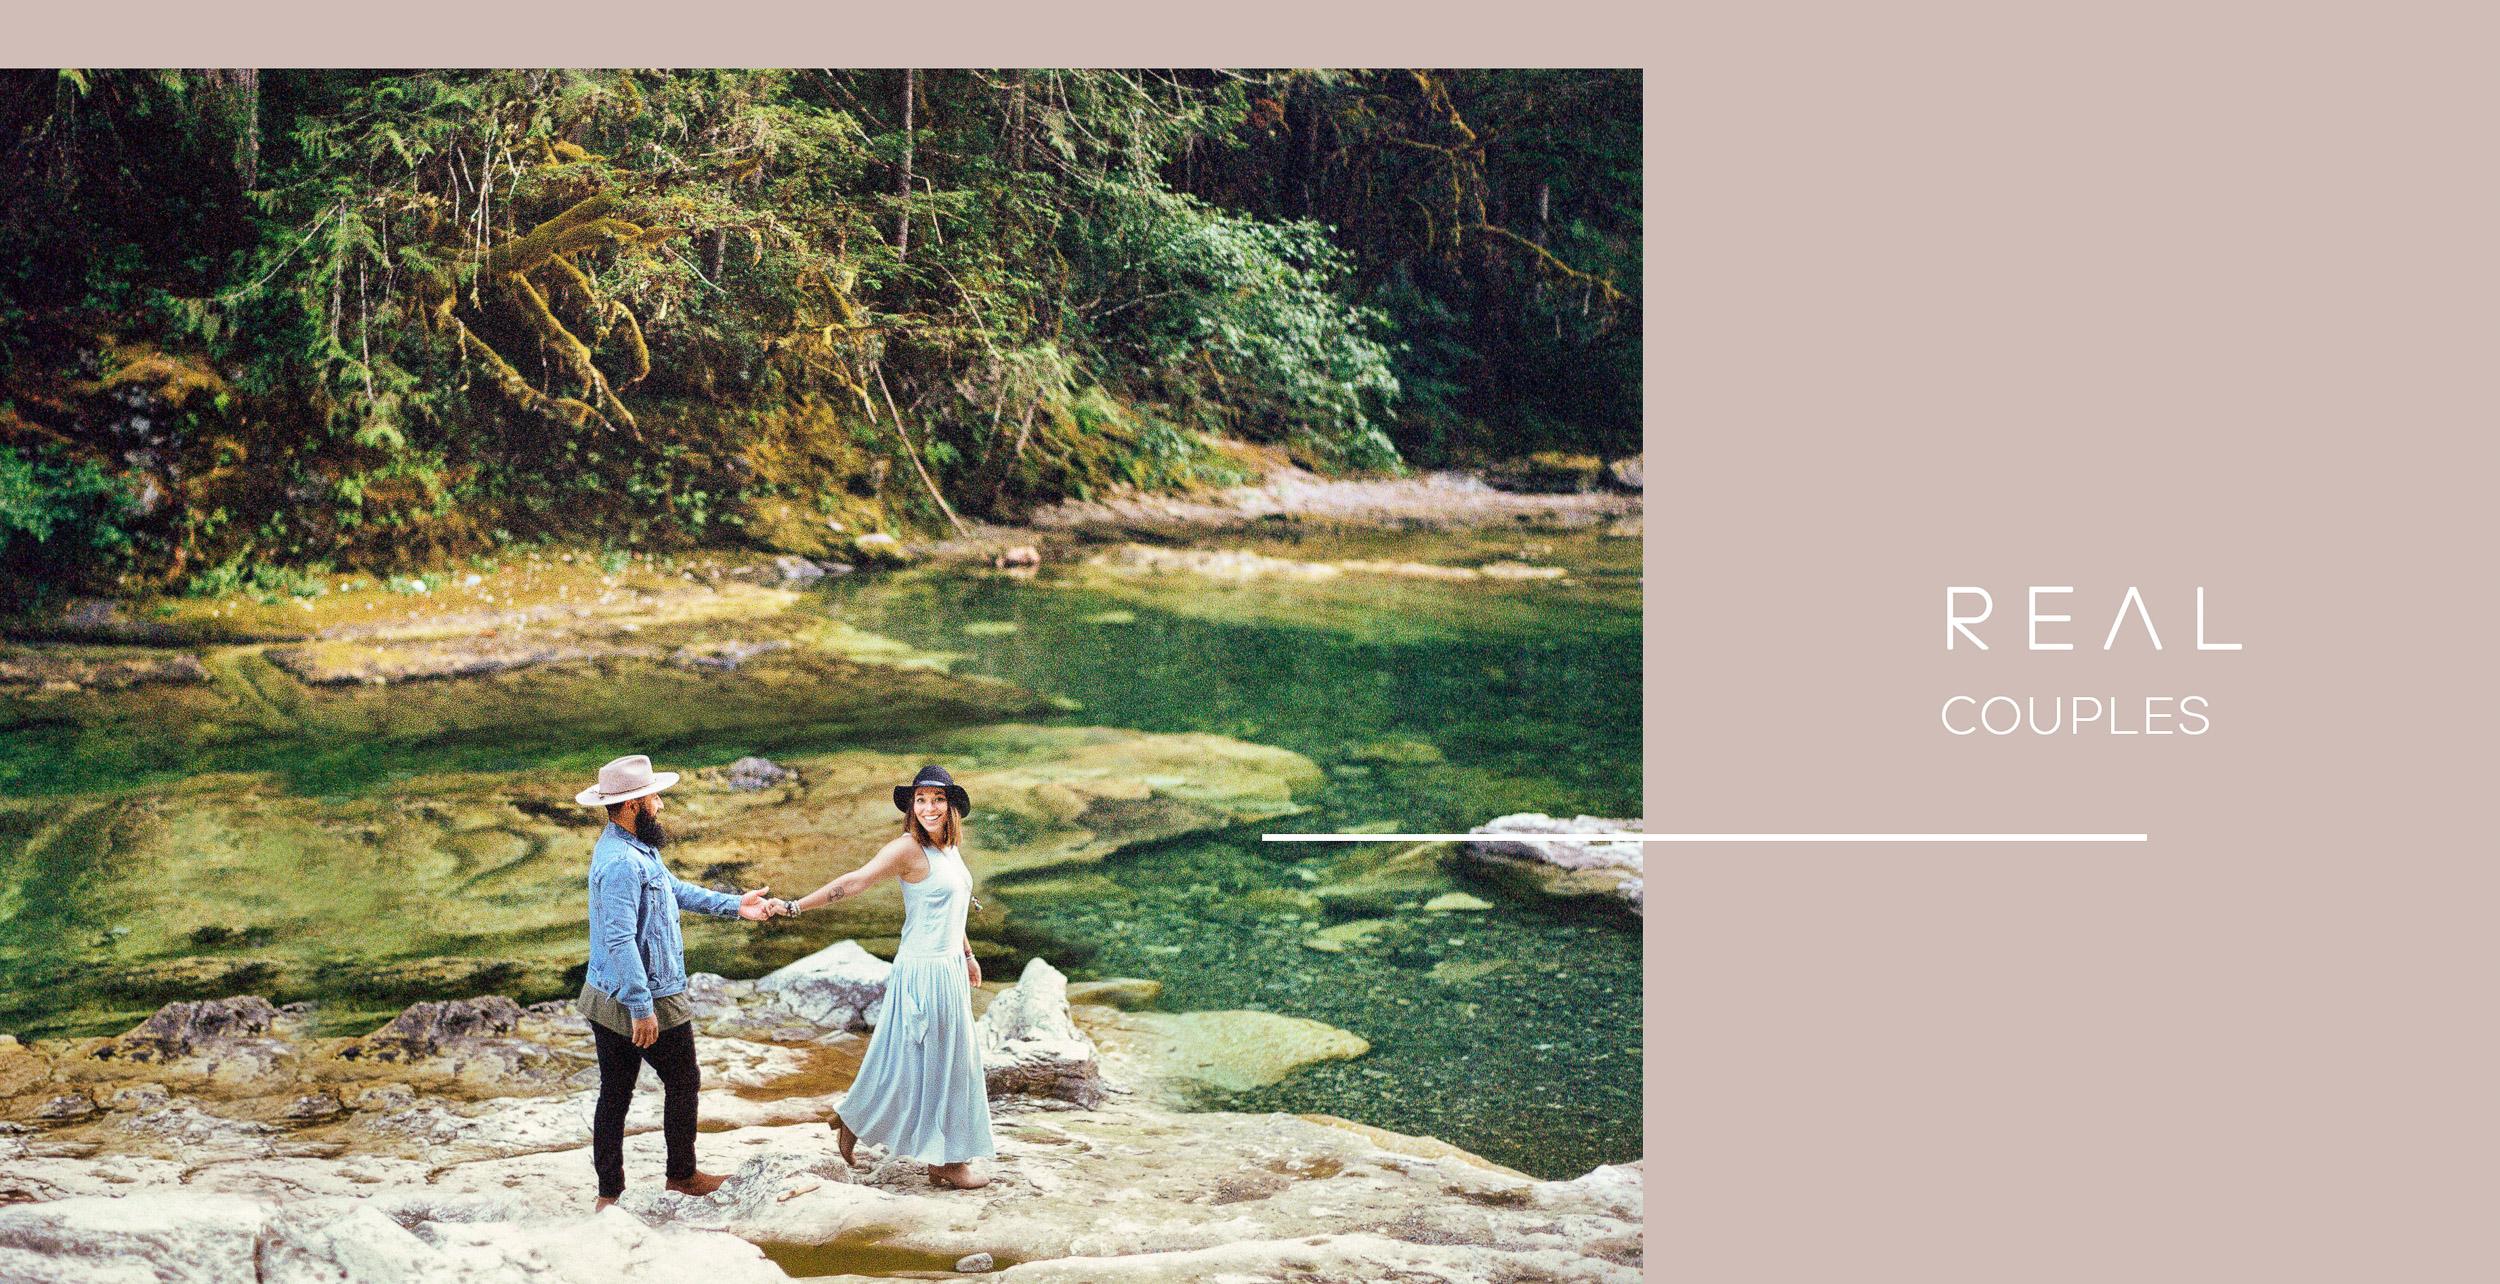 01_best+wedding+photographer+videographer+luxury+weddings+elopements_-1.jpg